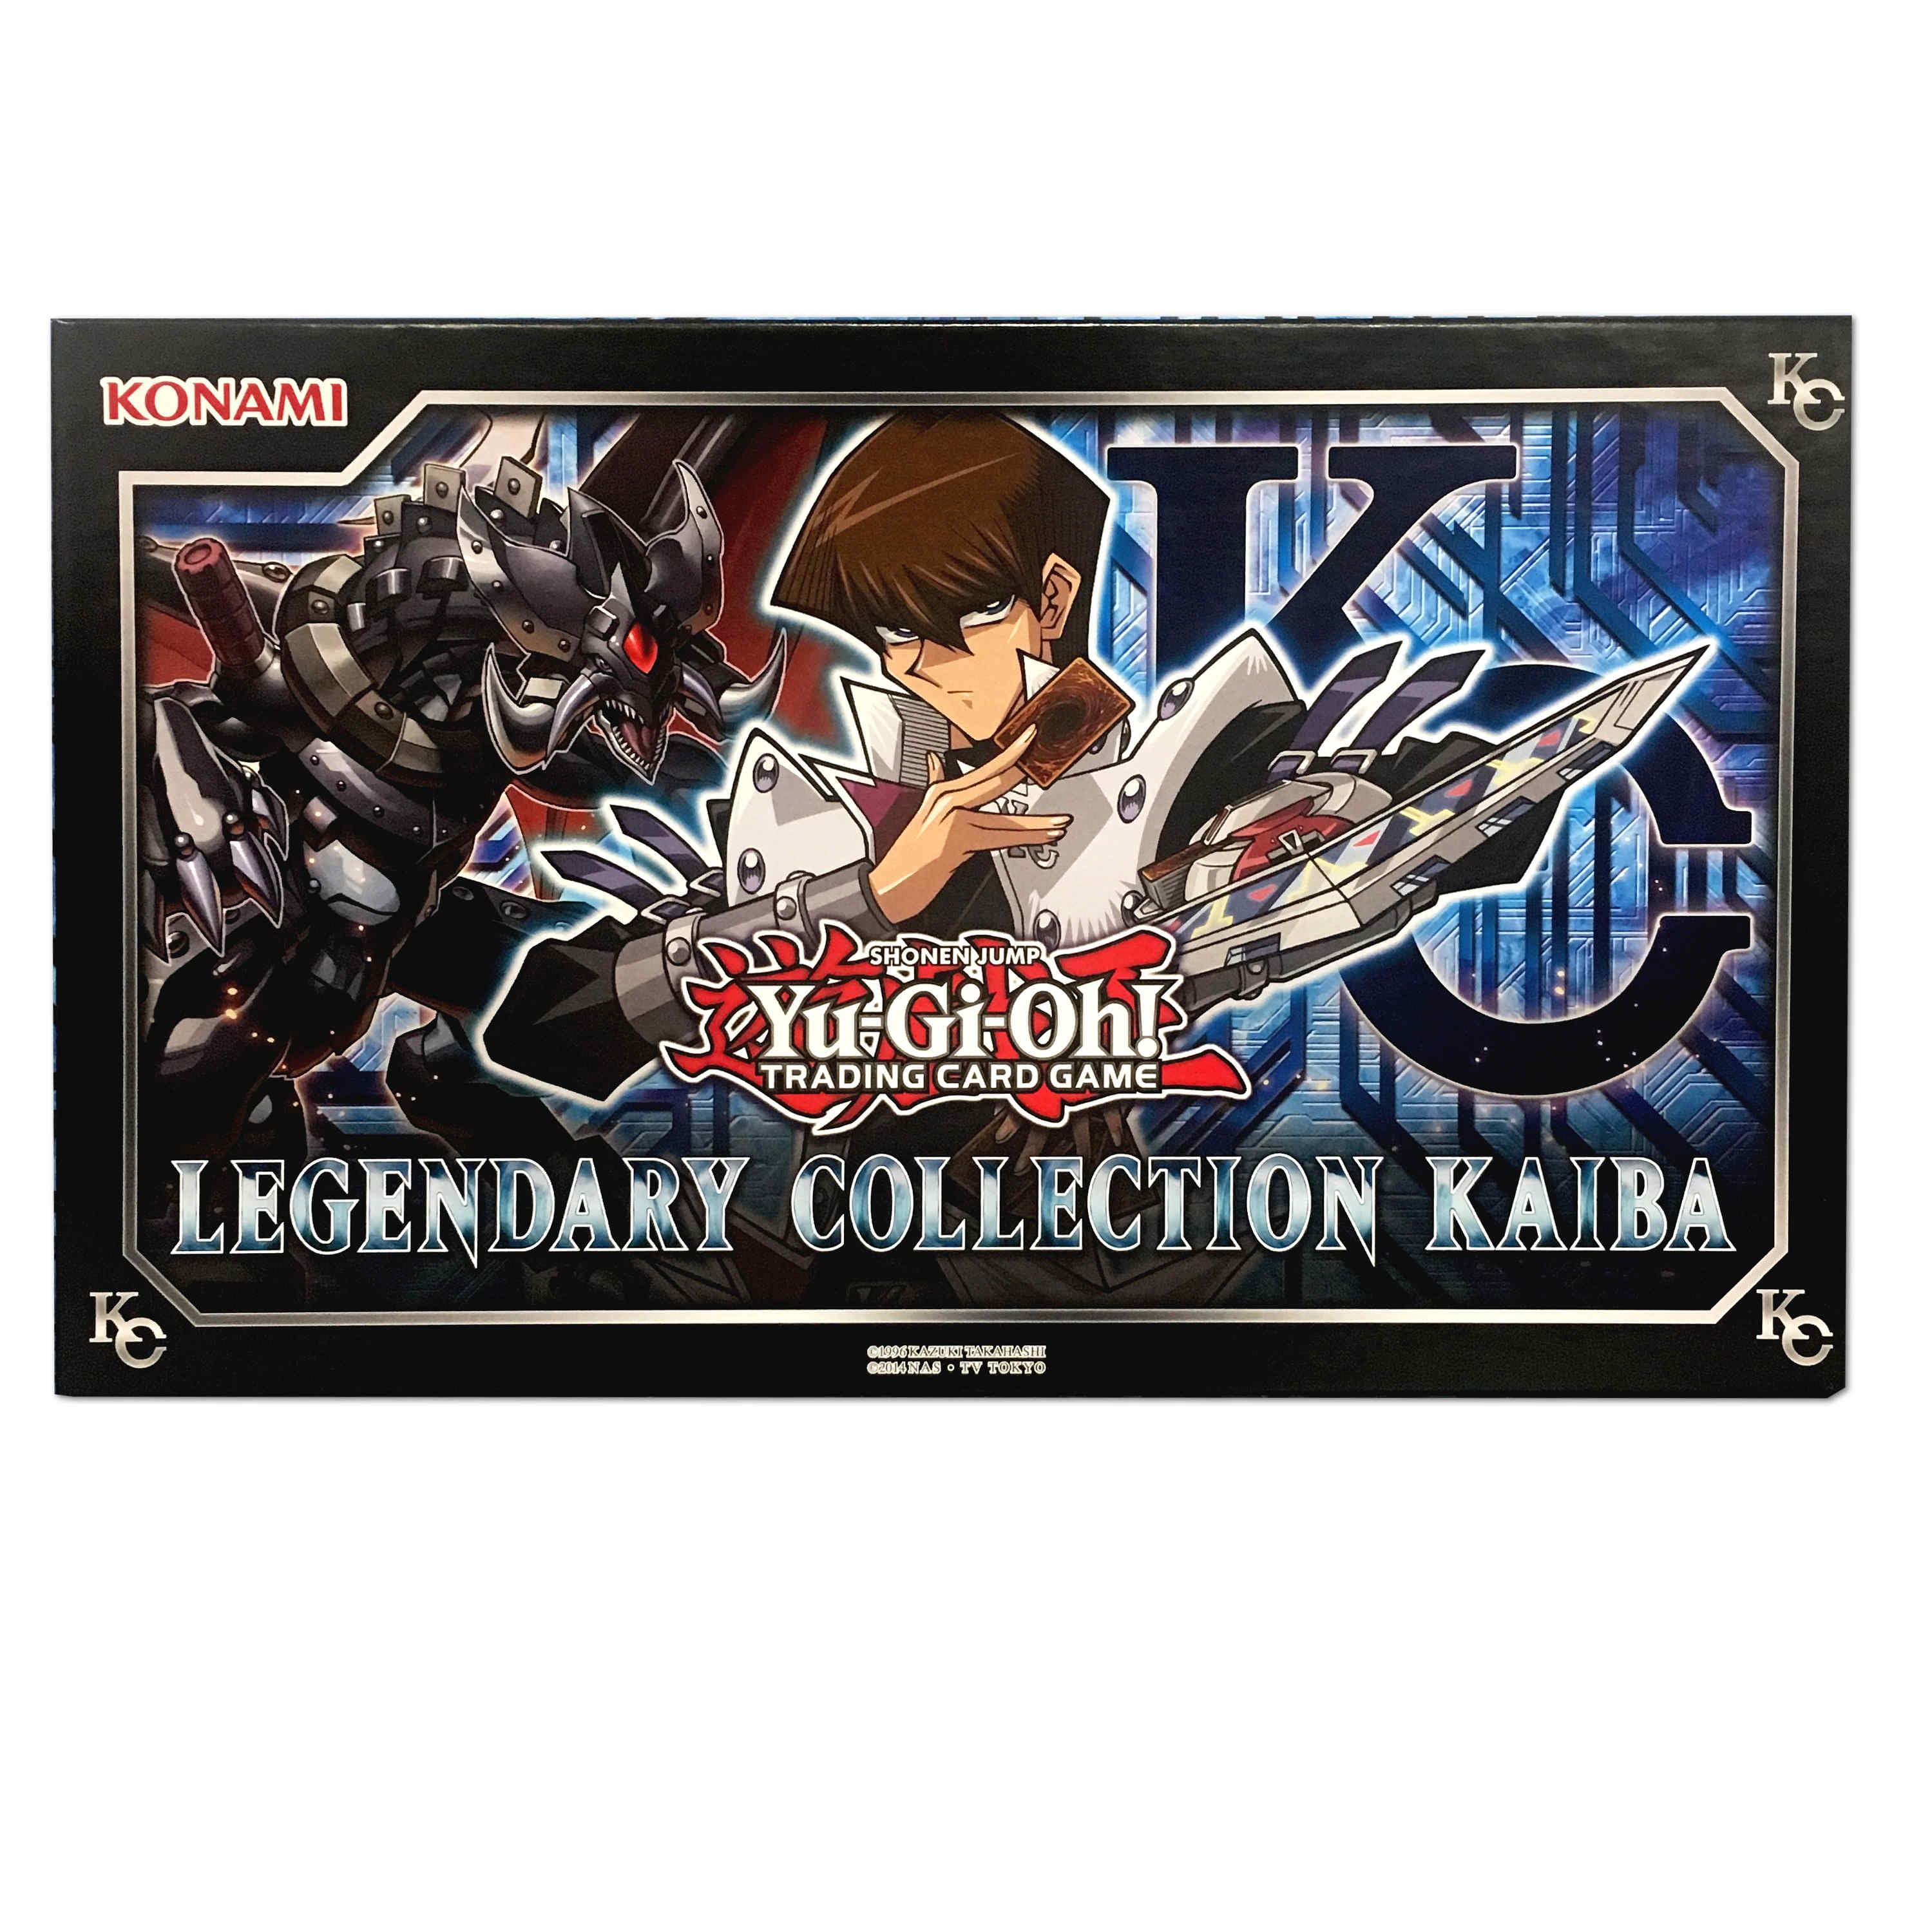 Yu-Gi-Oh! Legendary Collection Kaiba Box - Walmart.com